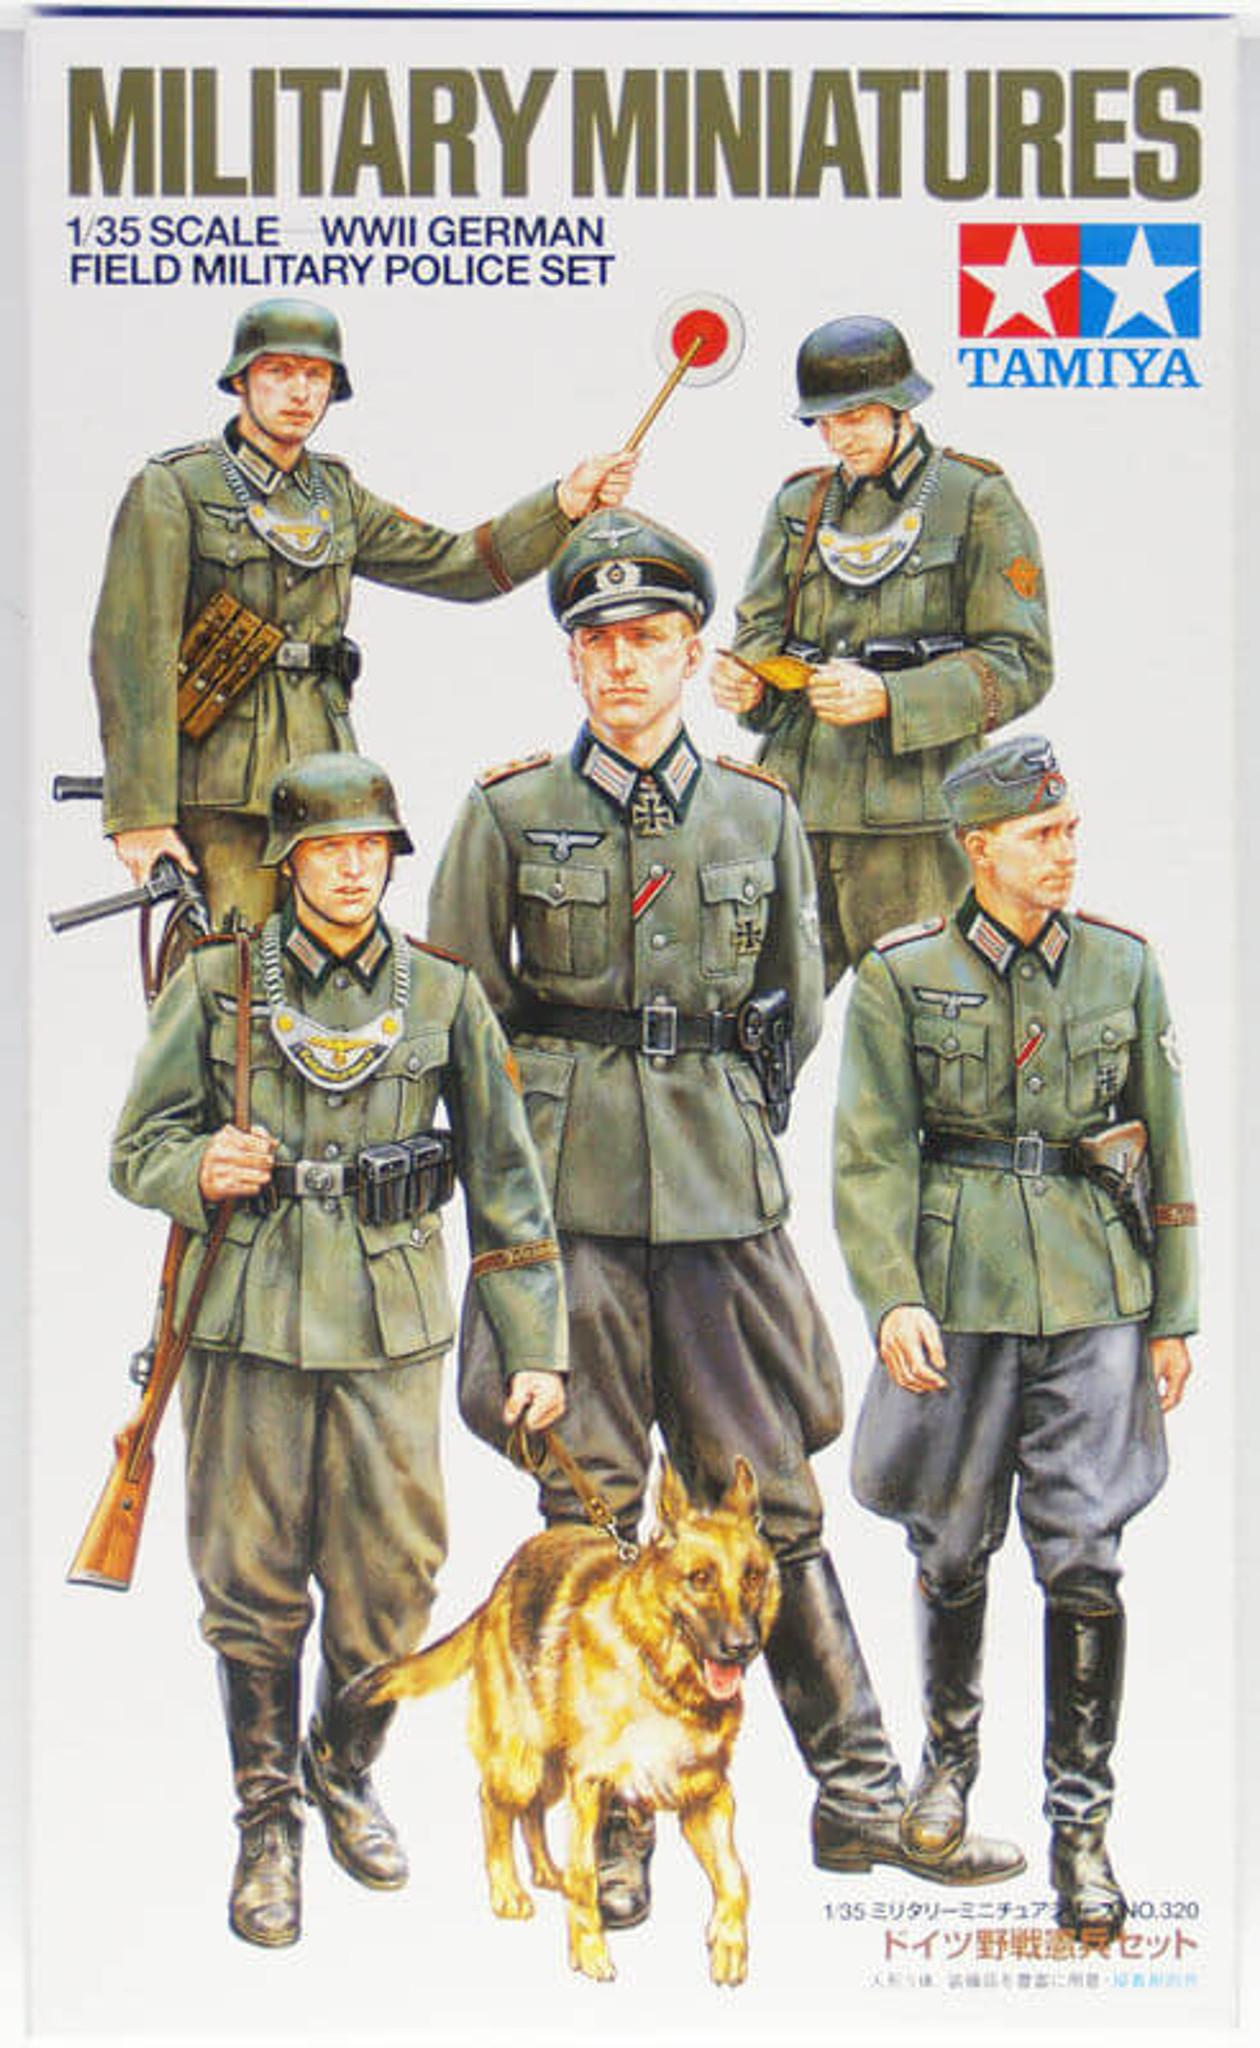 Tamiya 35320 WWII German Field Military Police Set 1/35 scale kit